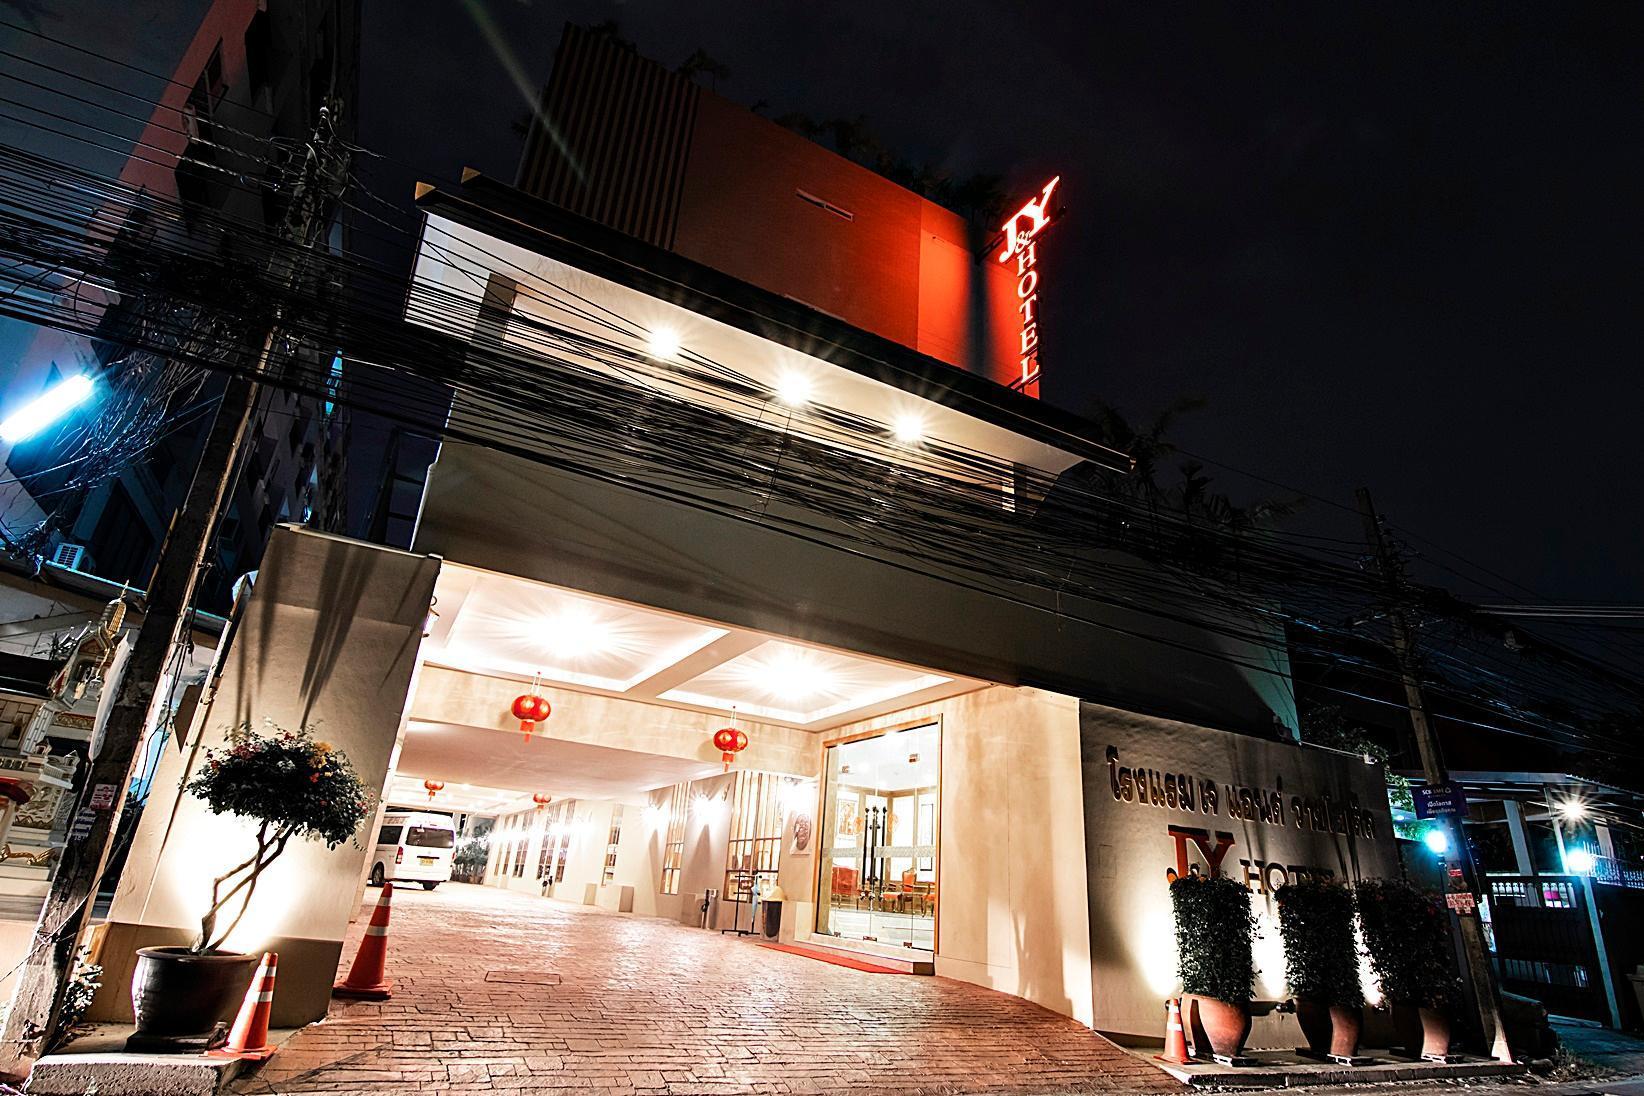 JandY Hotel